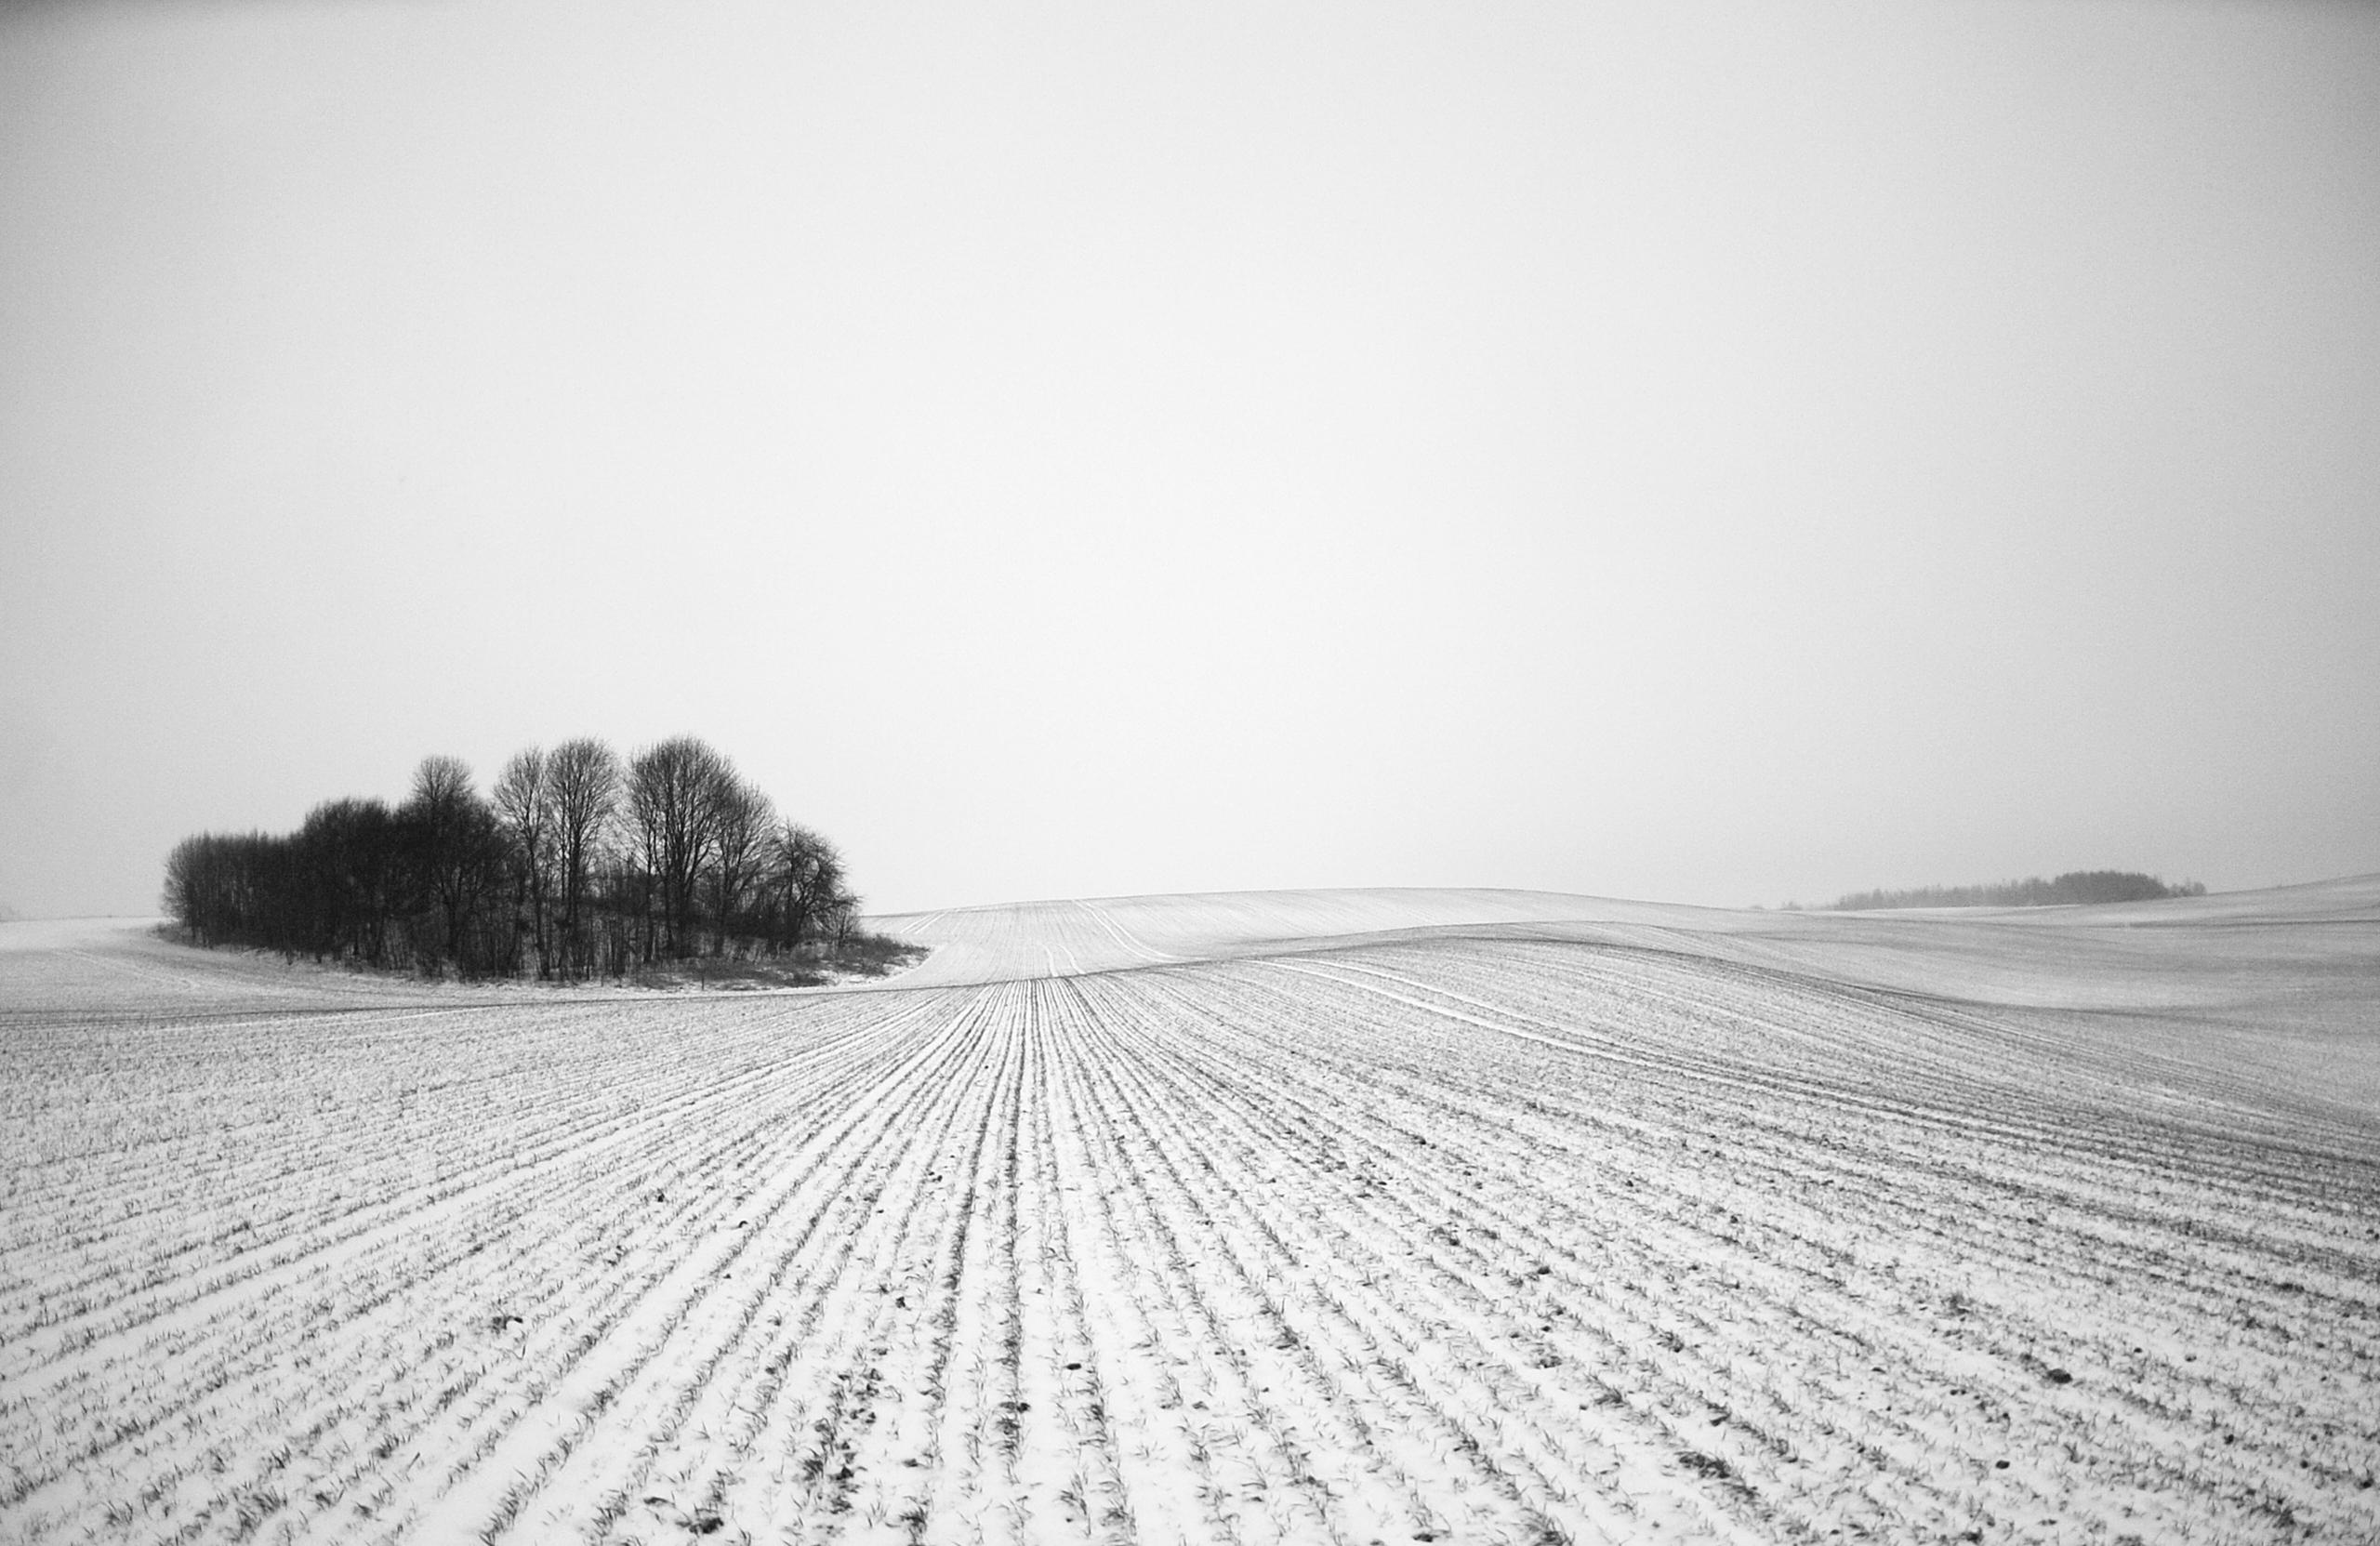 © Sigita Flaksienė 2012